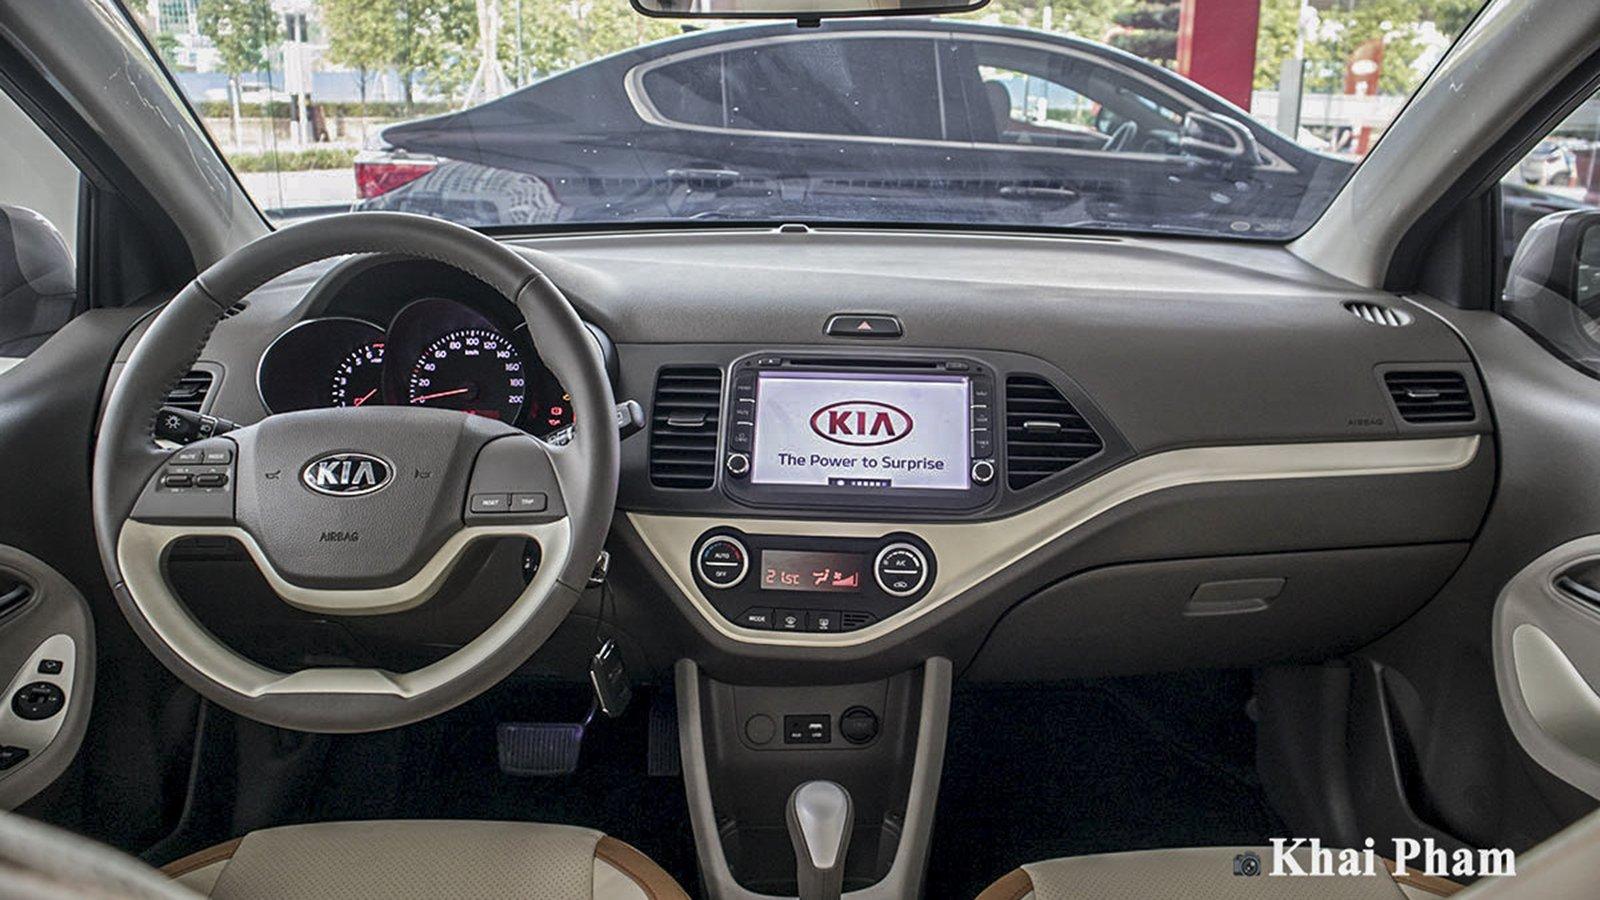 Ảnh Khoang lái xe Kia Morning 2020